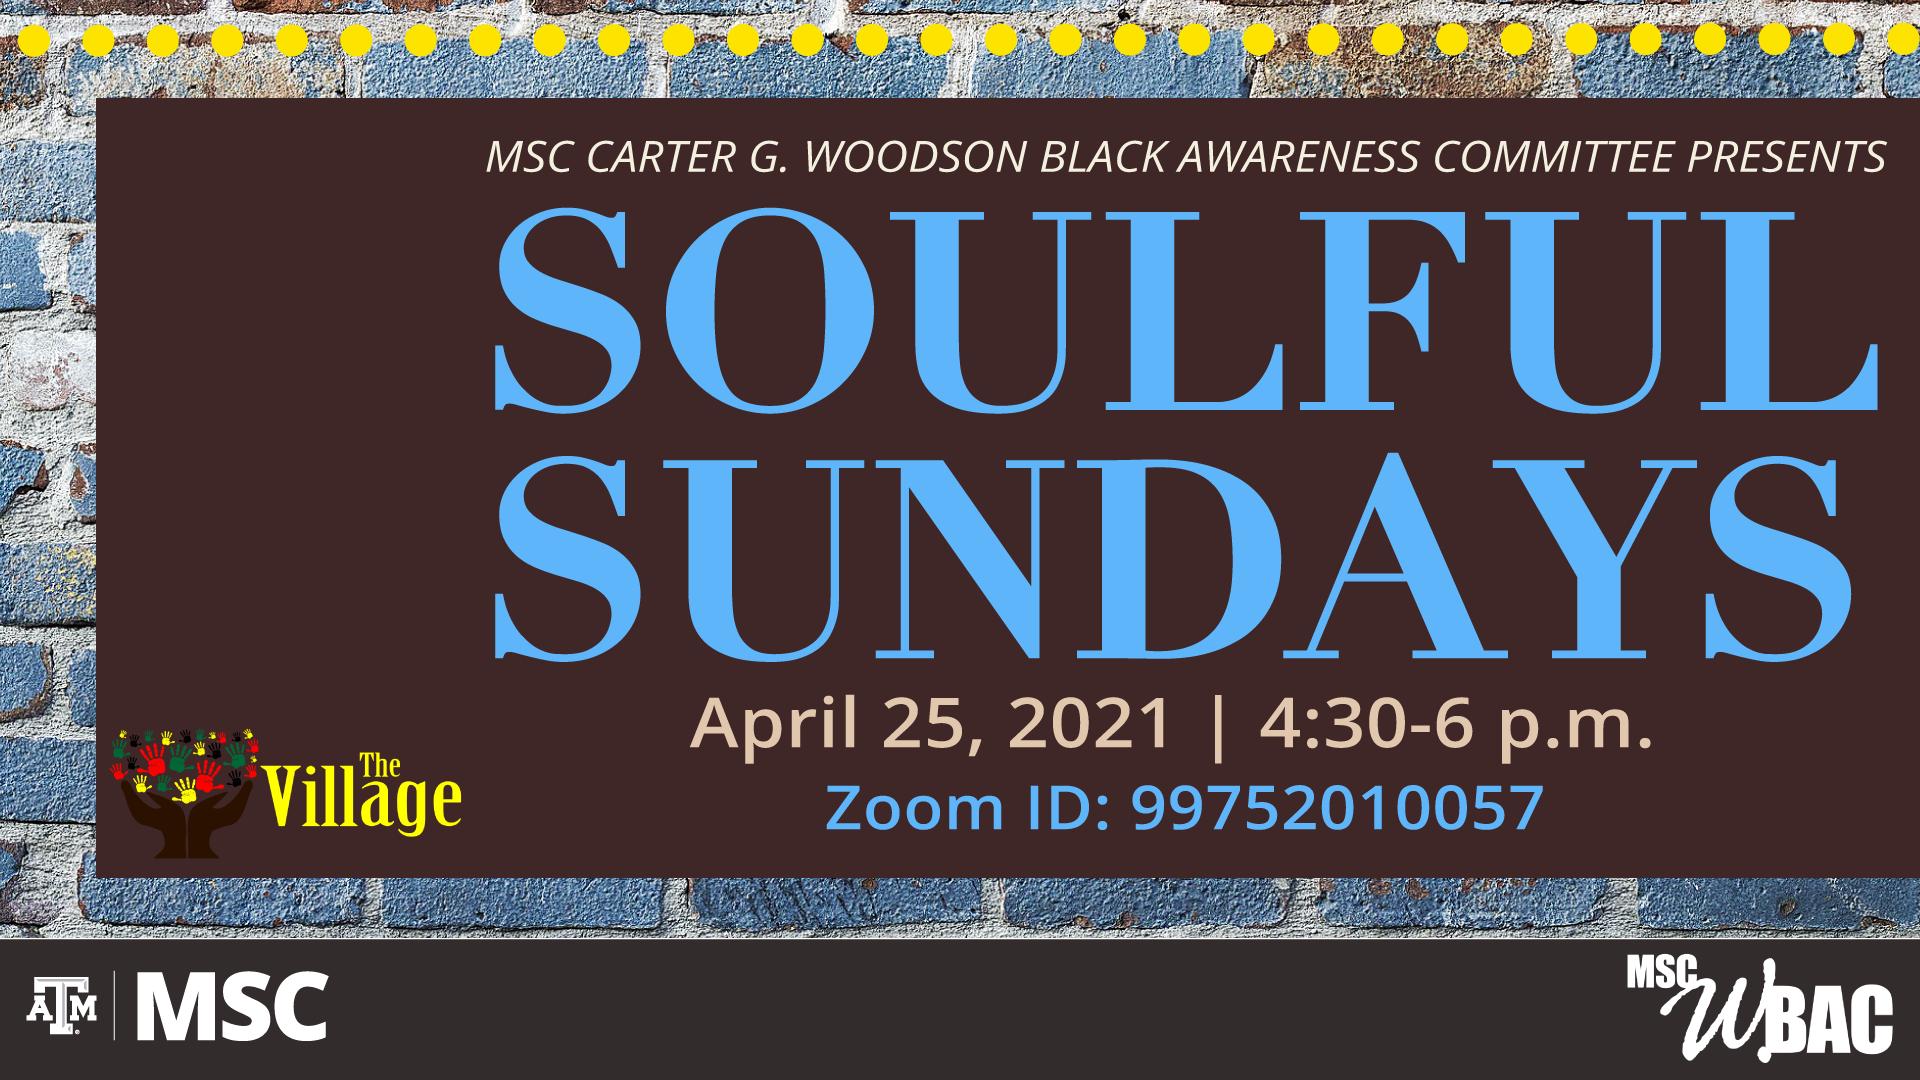 MSC WBAC presents Soulful Sundays, April 25, 2021 at 4:30 to 6 p.m.via Zoom ID: 99752010057